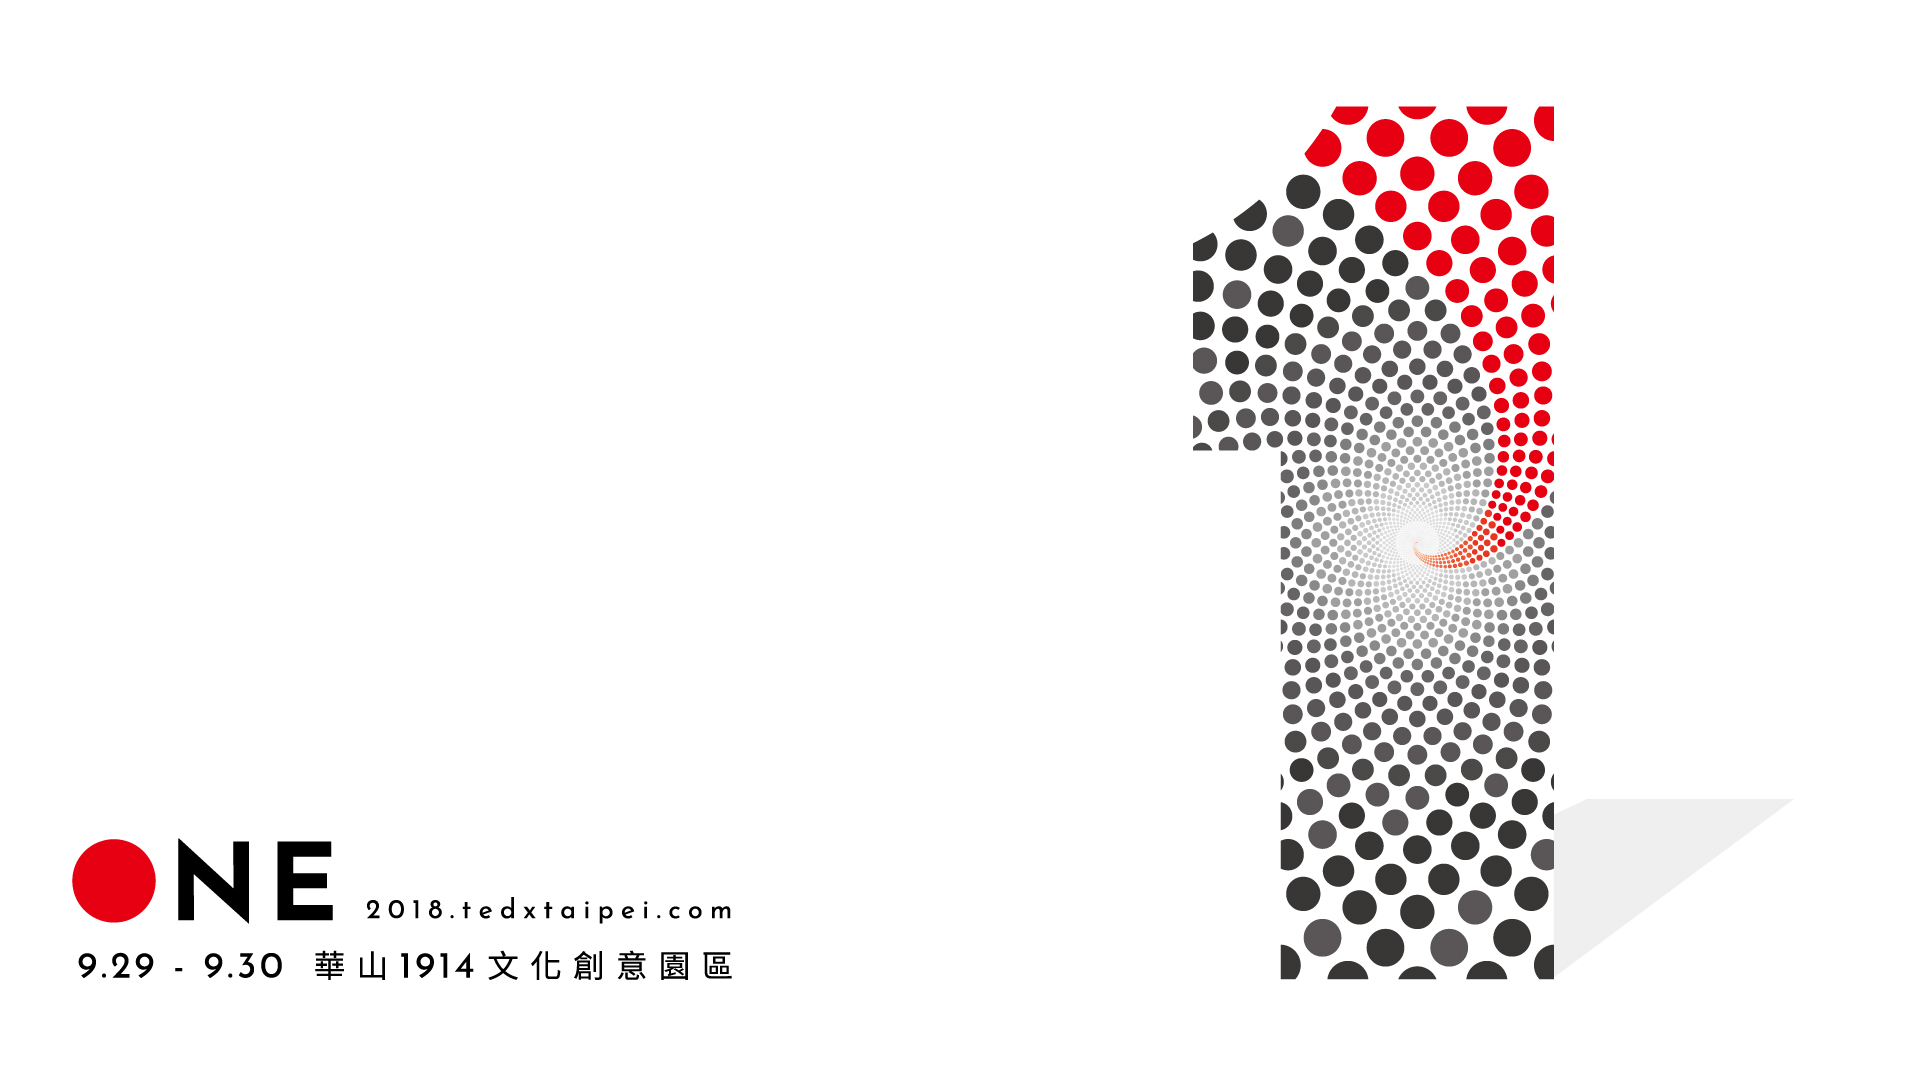 TEDxTaipei 2018年會:ONE